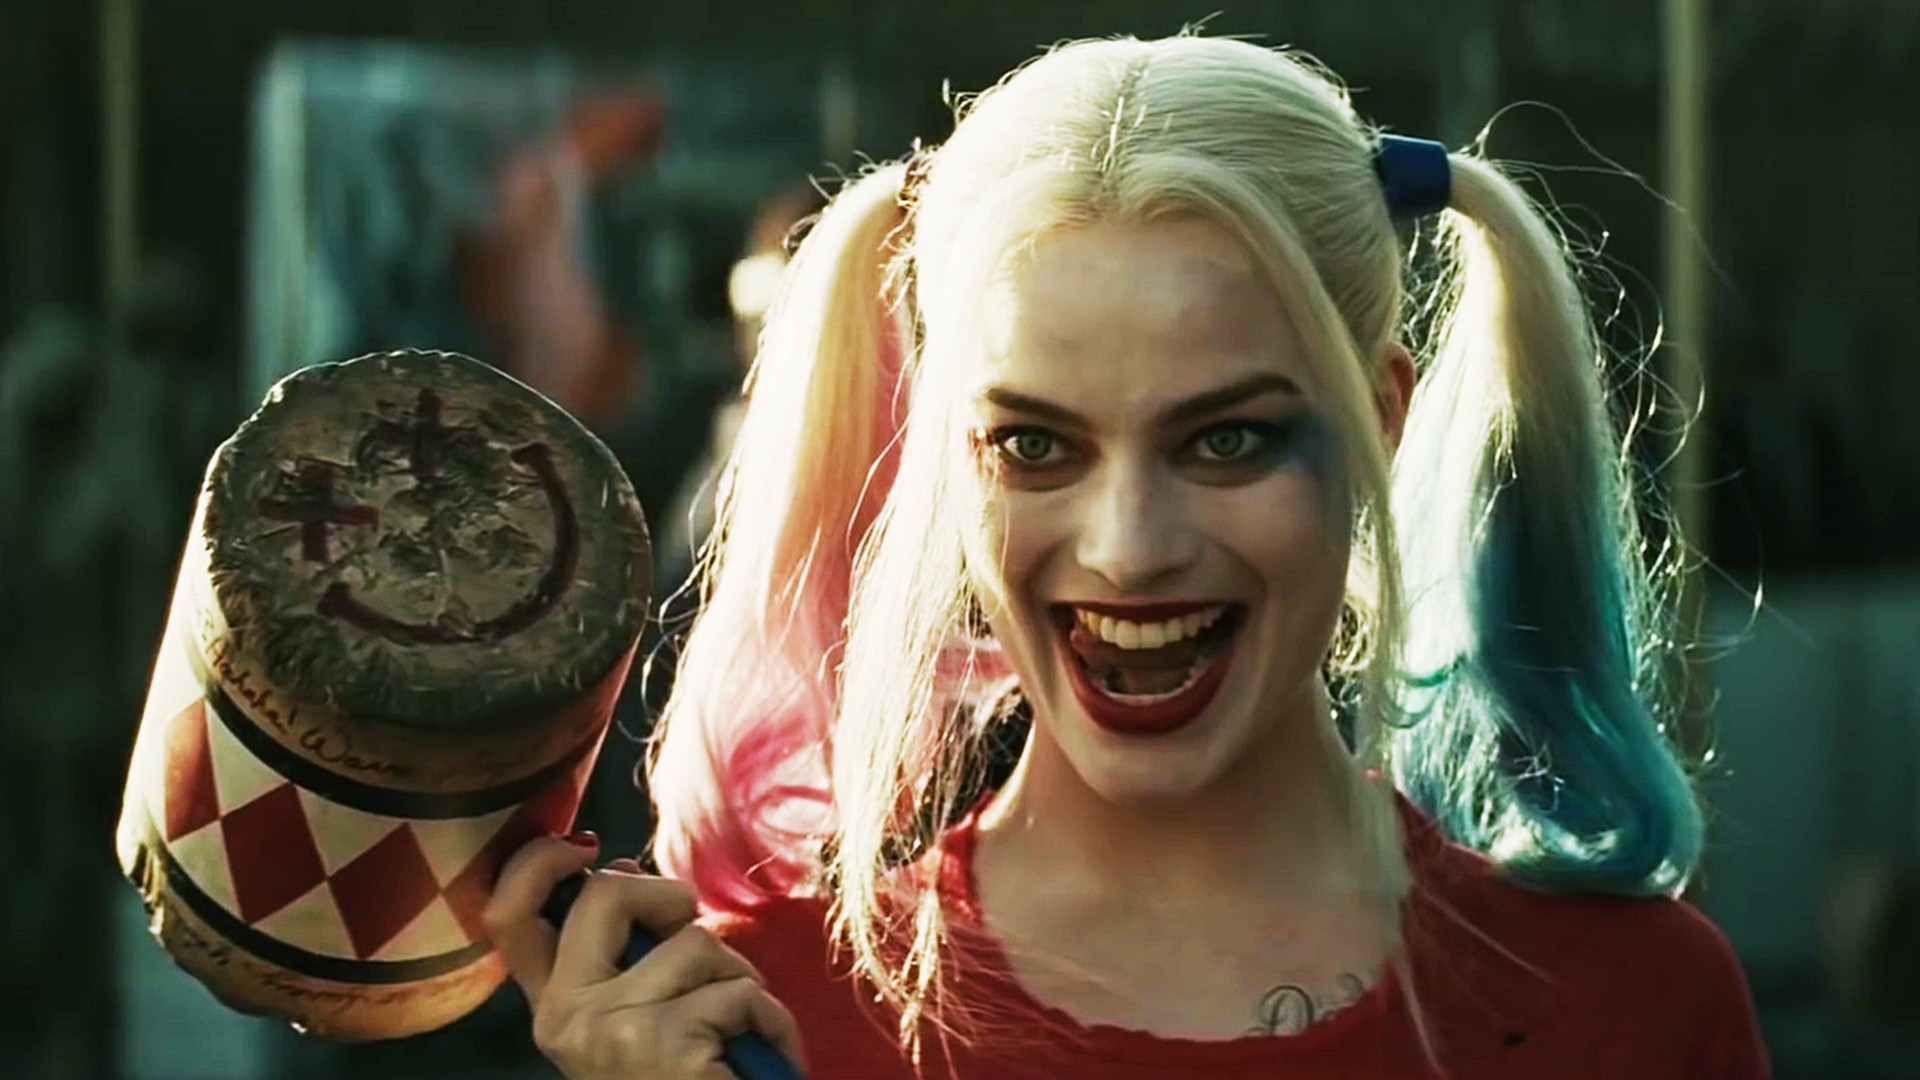 Suicide Squad Harleen Quinzel Harley Quinn Wallpaper 05556